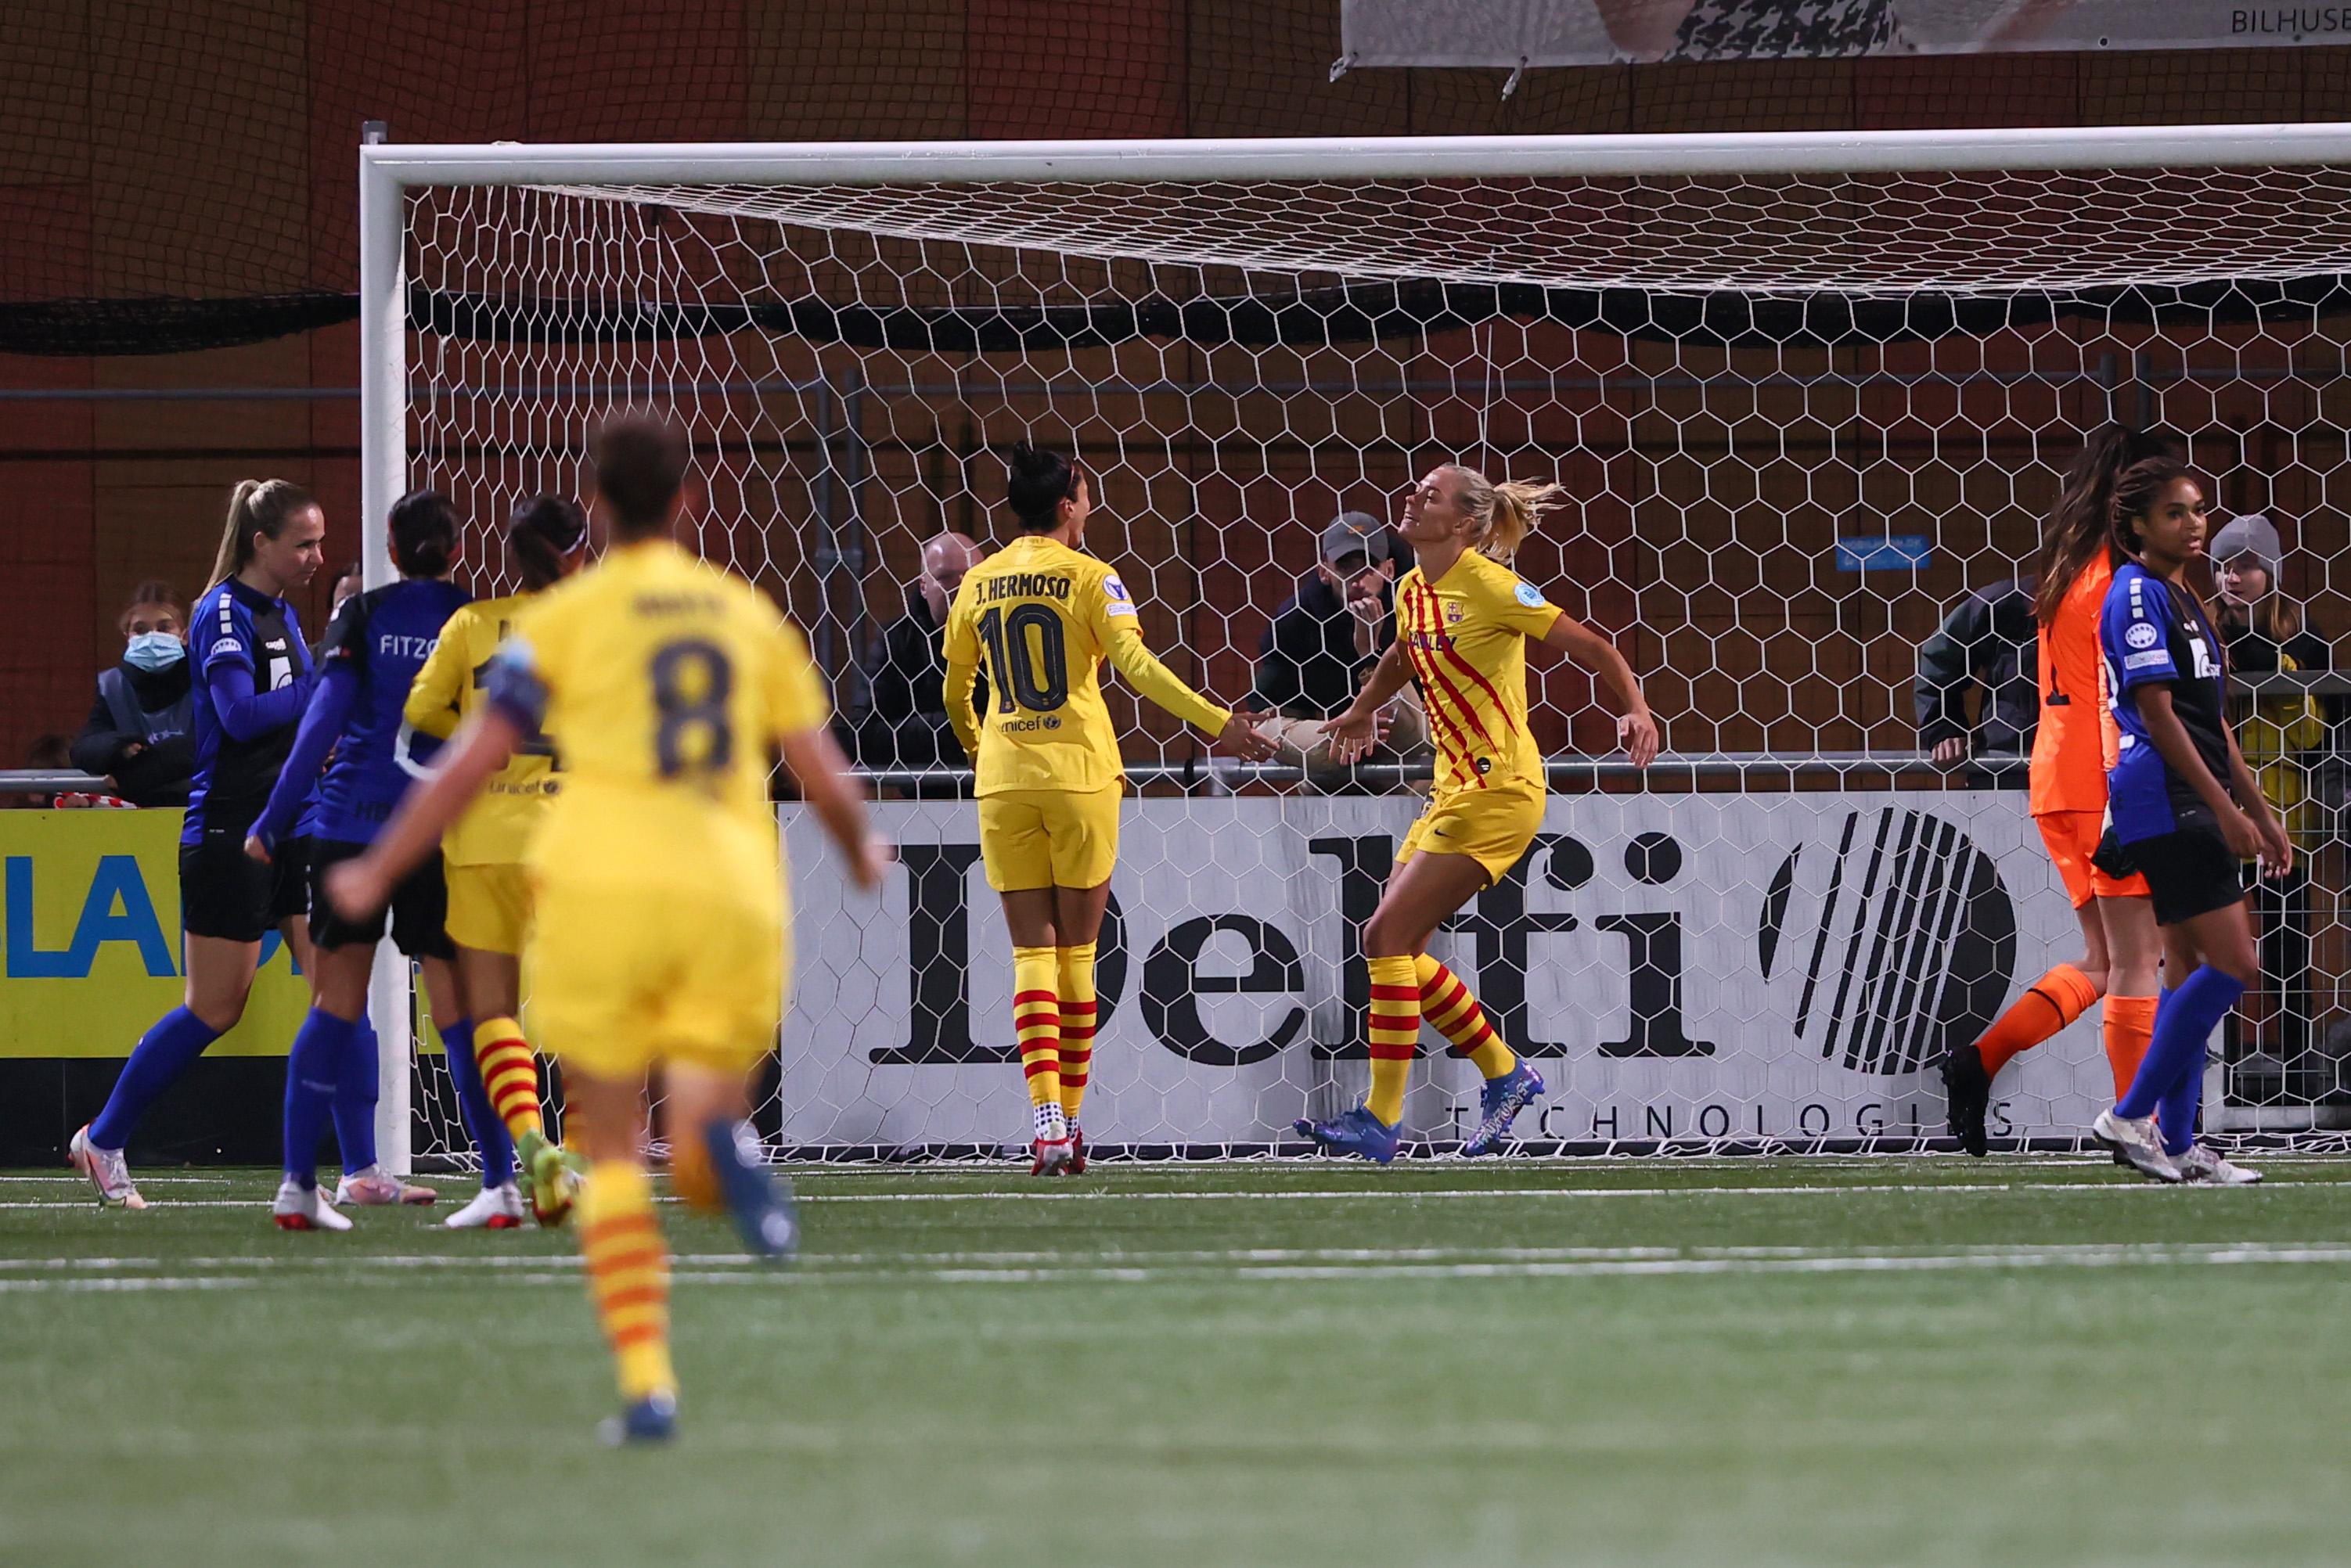 HB Koege v FC Barcelona: Group C - UEFA Women's Champions League